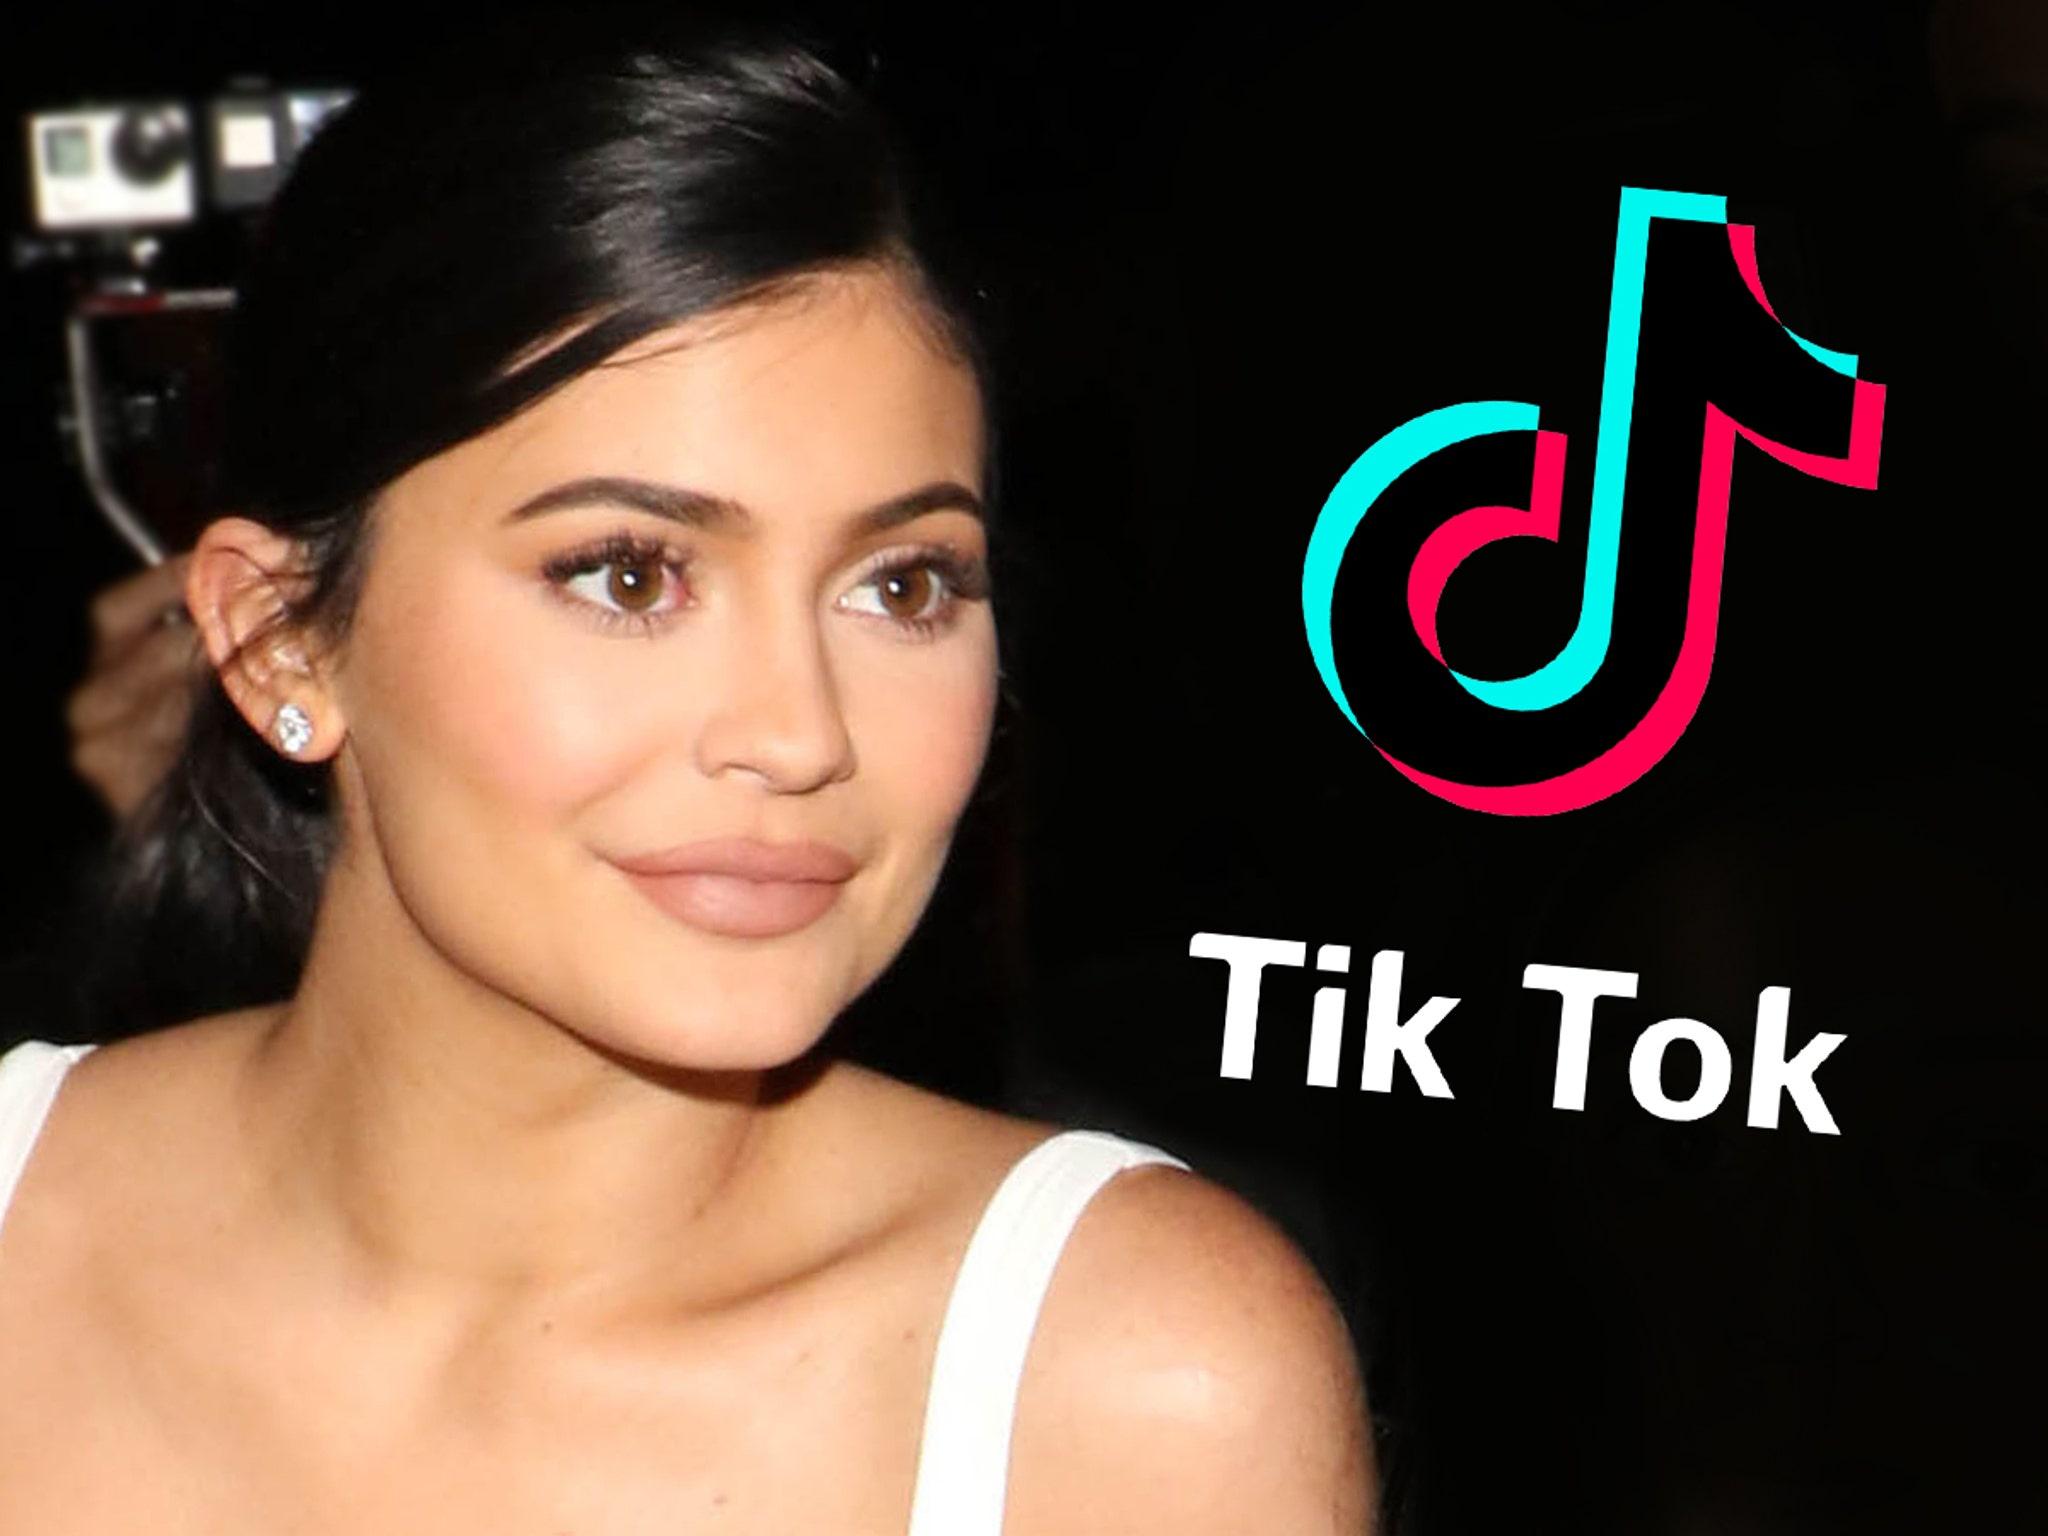 Kylie Jenner's 'Rise & Shine' Hashtag Hits 1 Billion Views on TikTok